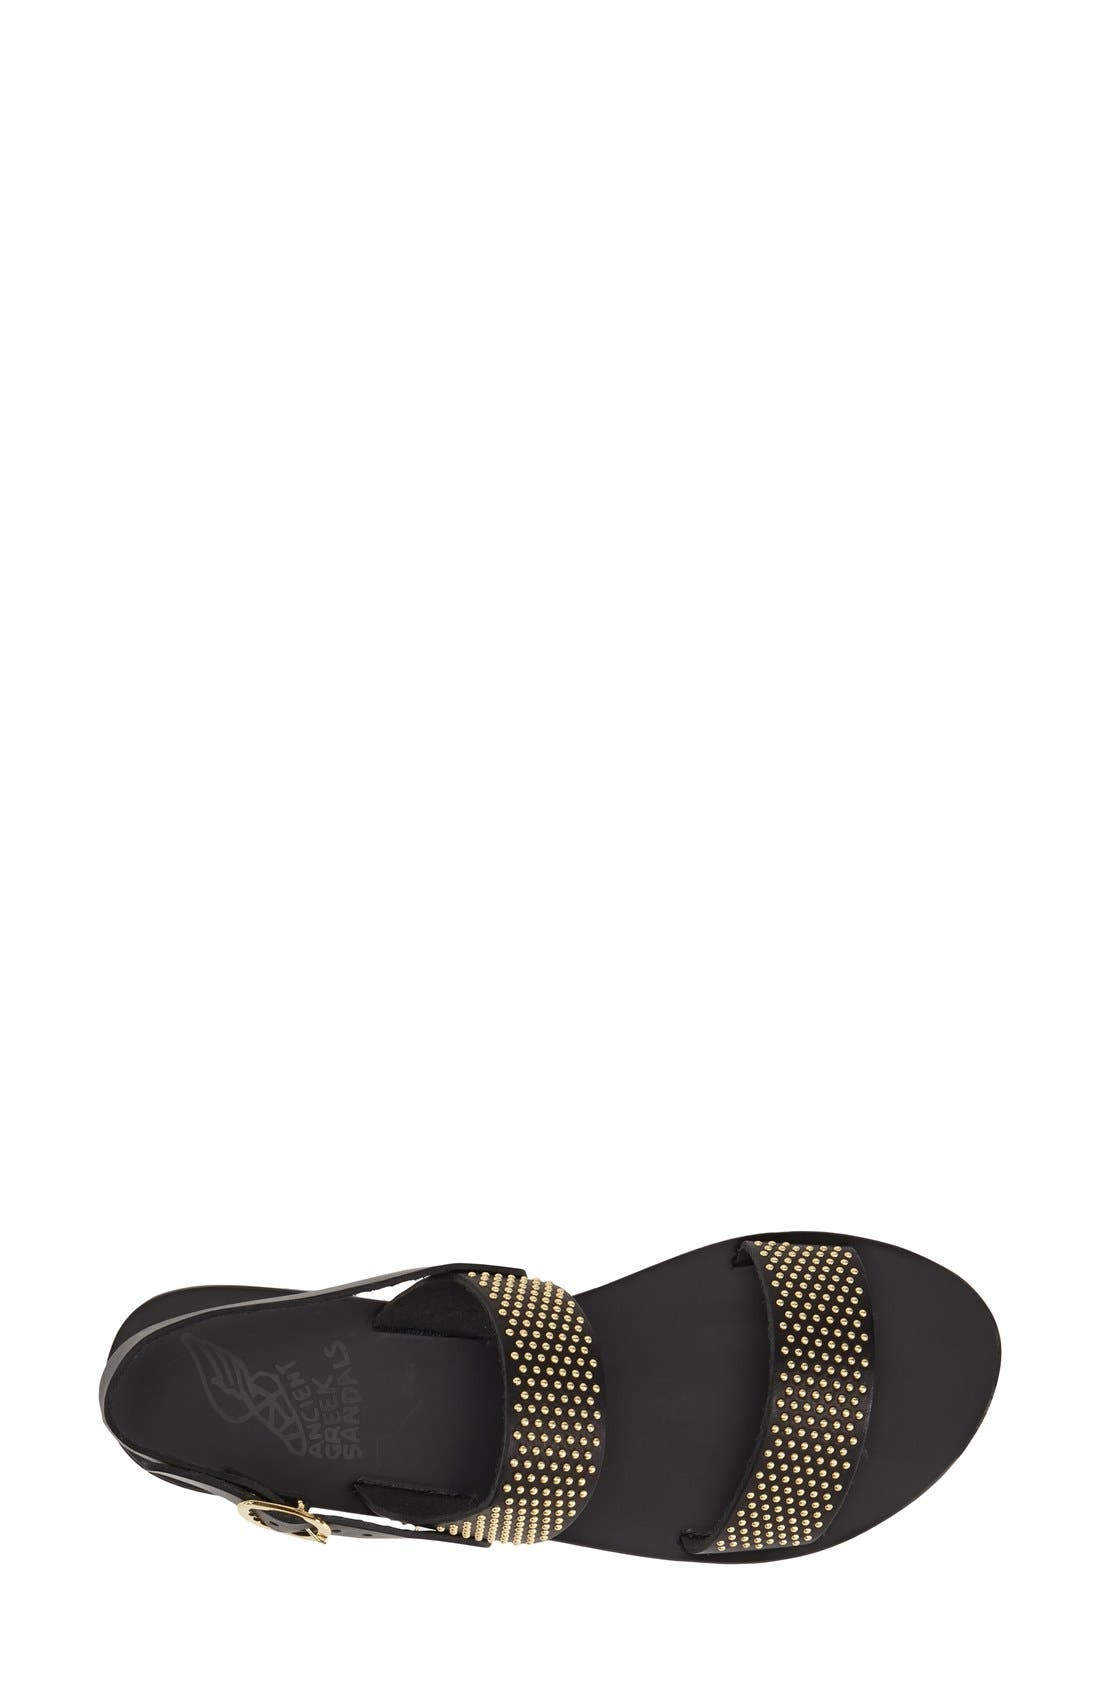 Alternate Image 3  - Ancient Greek Sandals 'Dinami' Studded Double Band Sandal (Women)